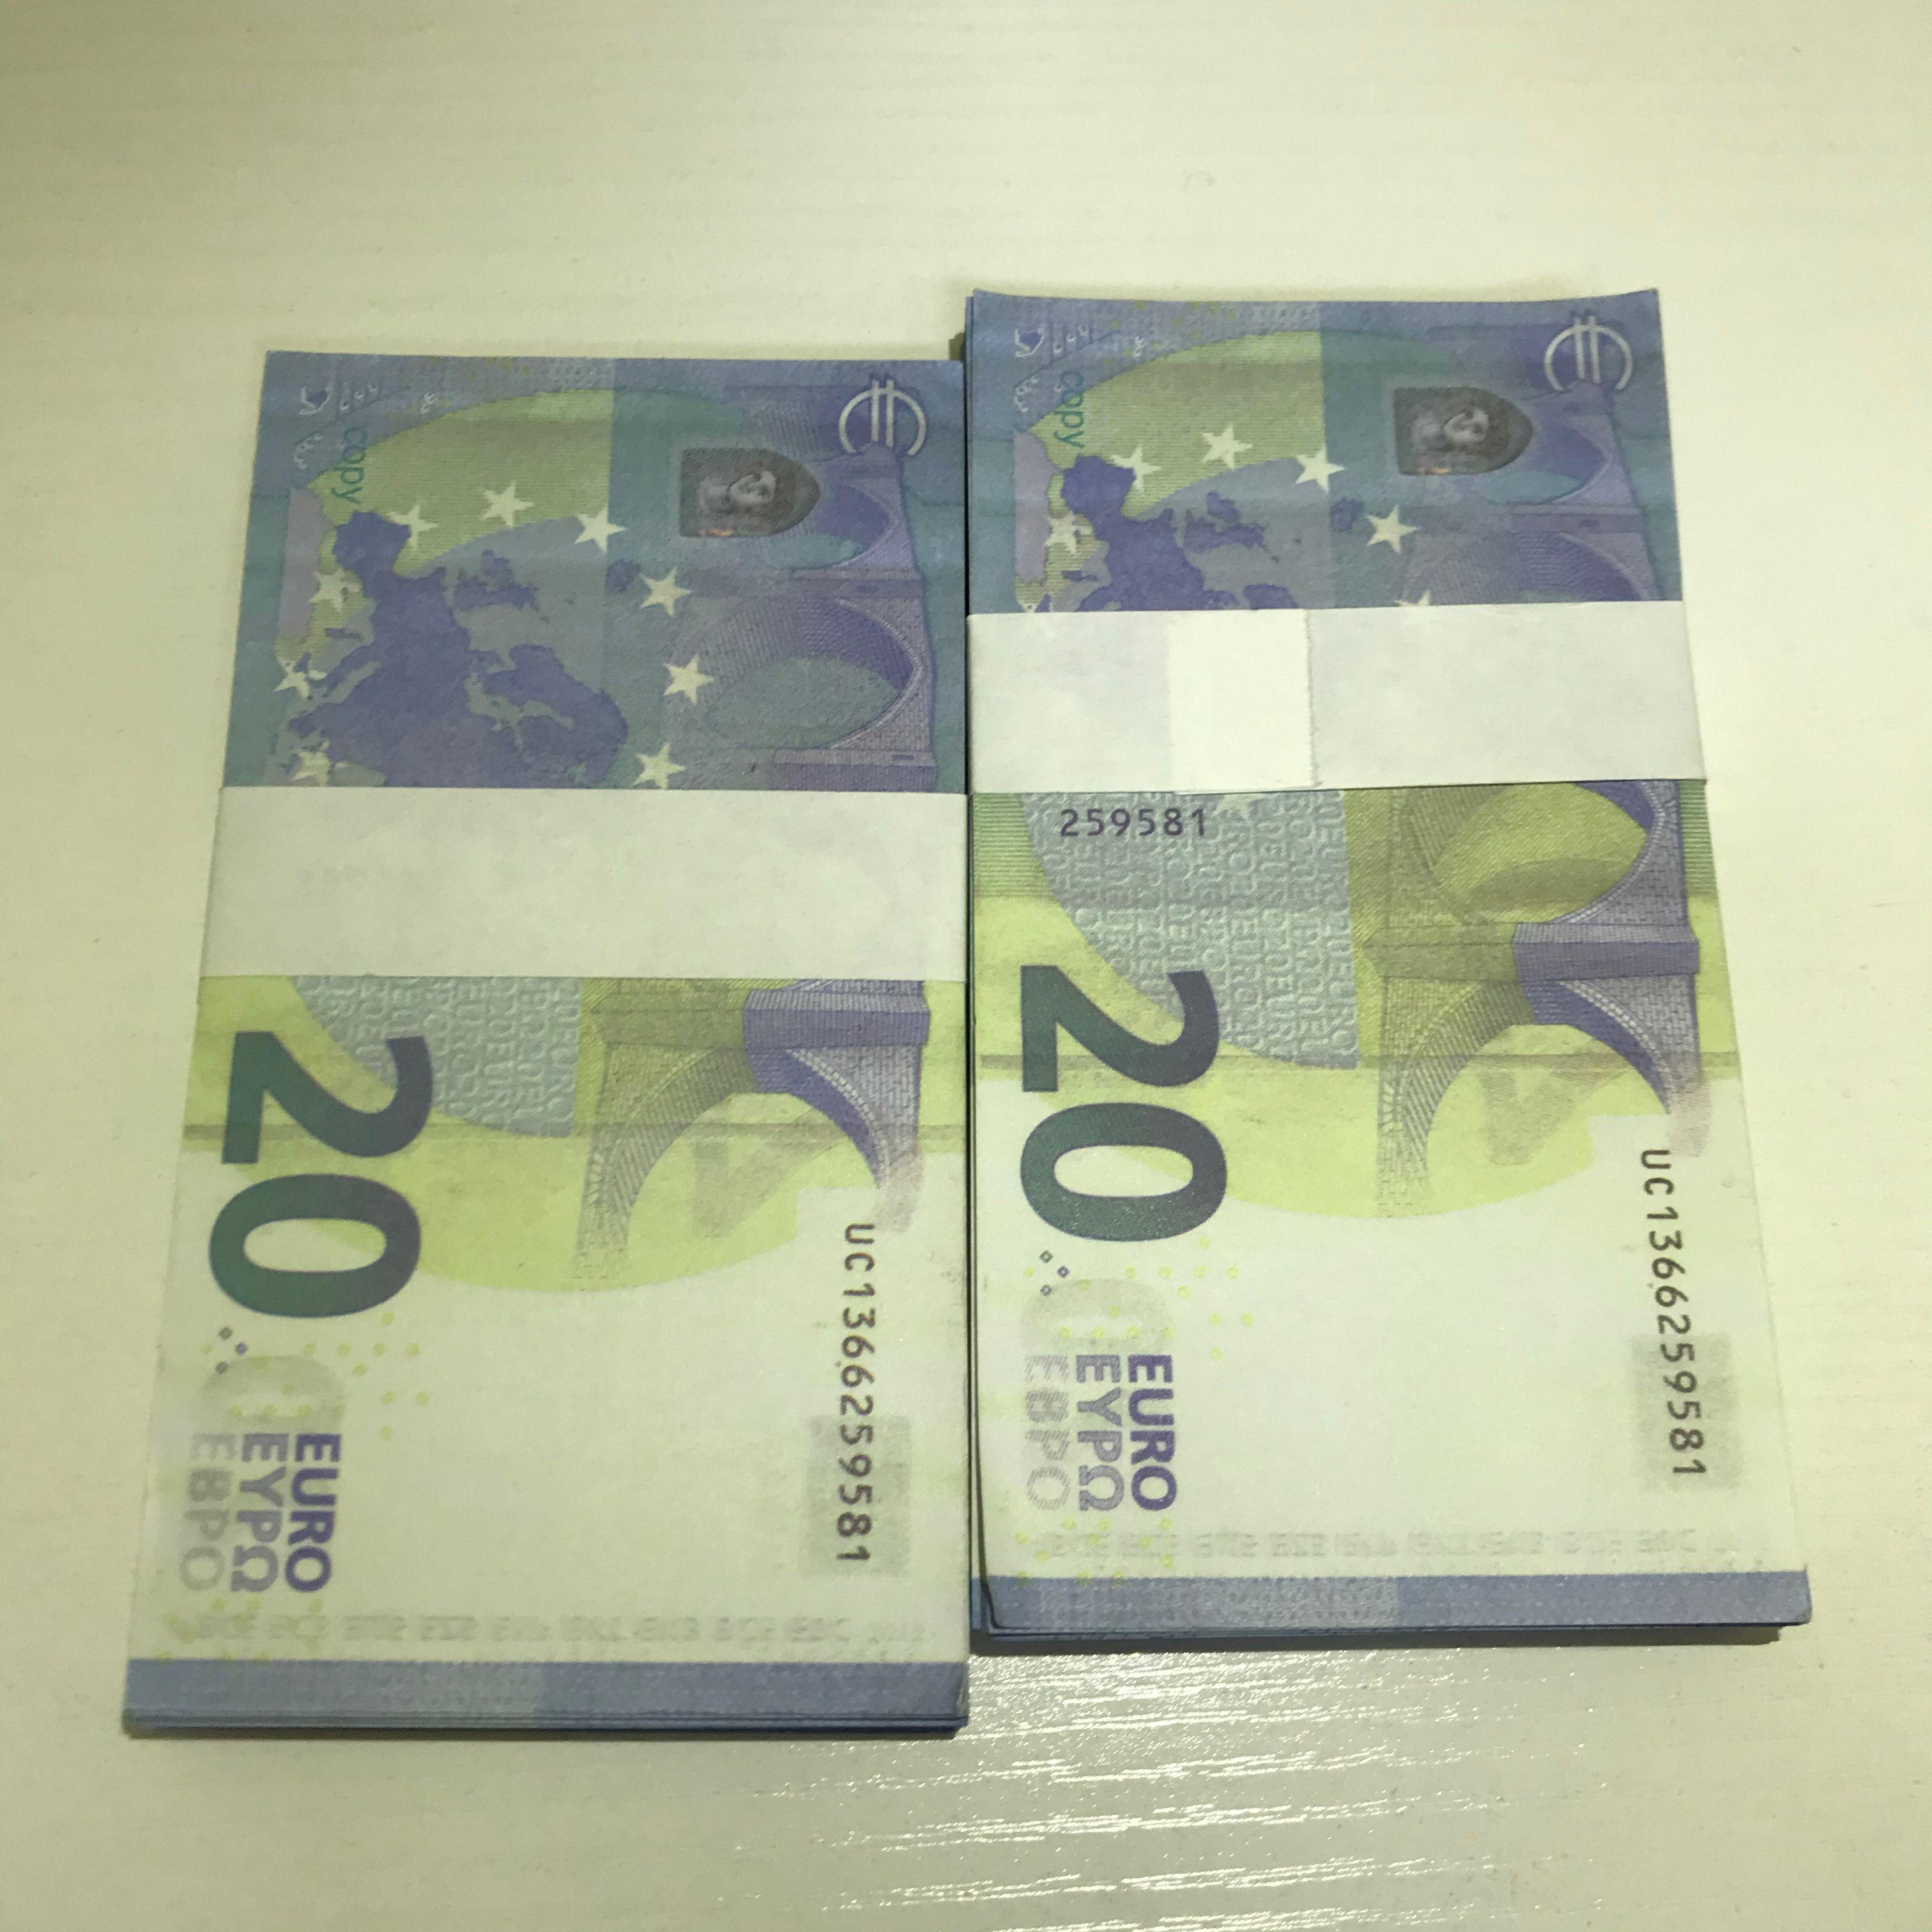 EURO Money Ovuh Prup реквизит Faux заготовка Complefect LE20-06 TV фунт валюта и стрельба доллар барной пленки реквизит IHHCF